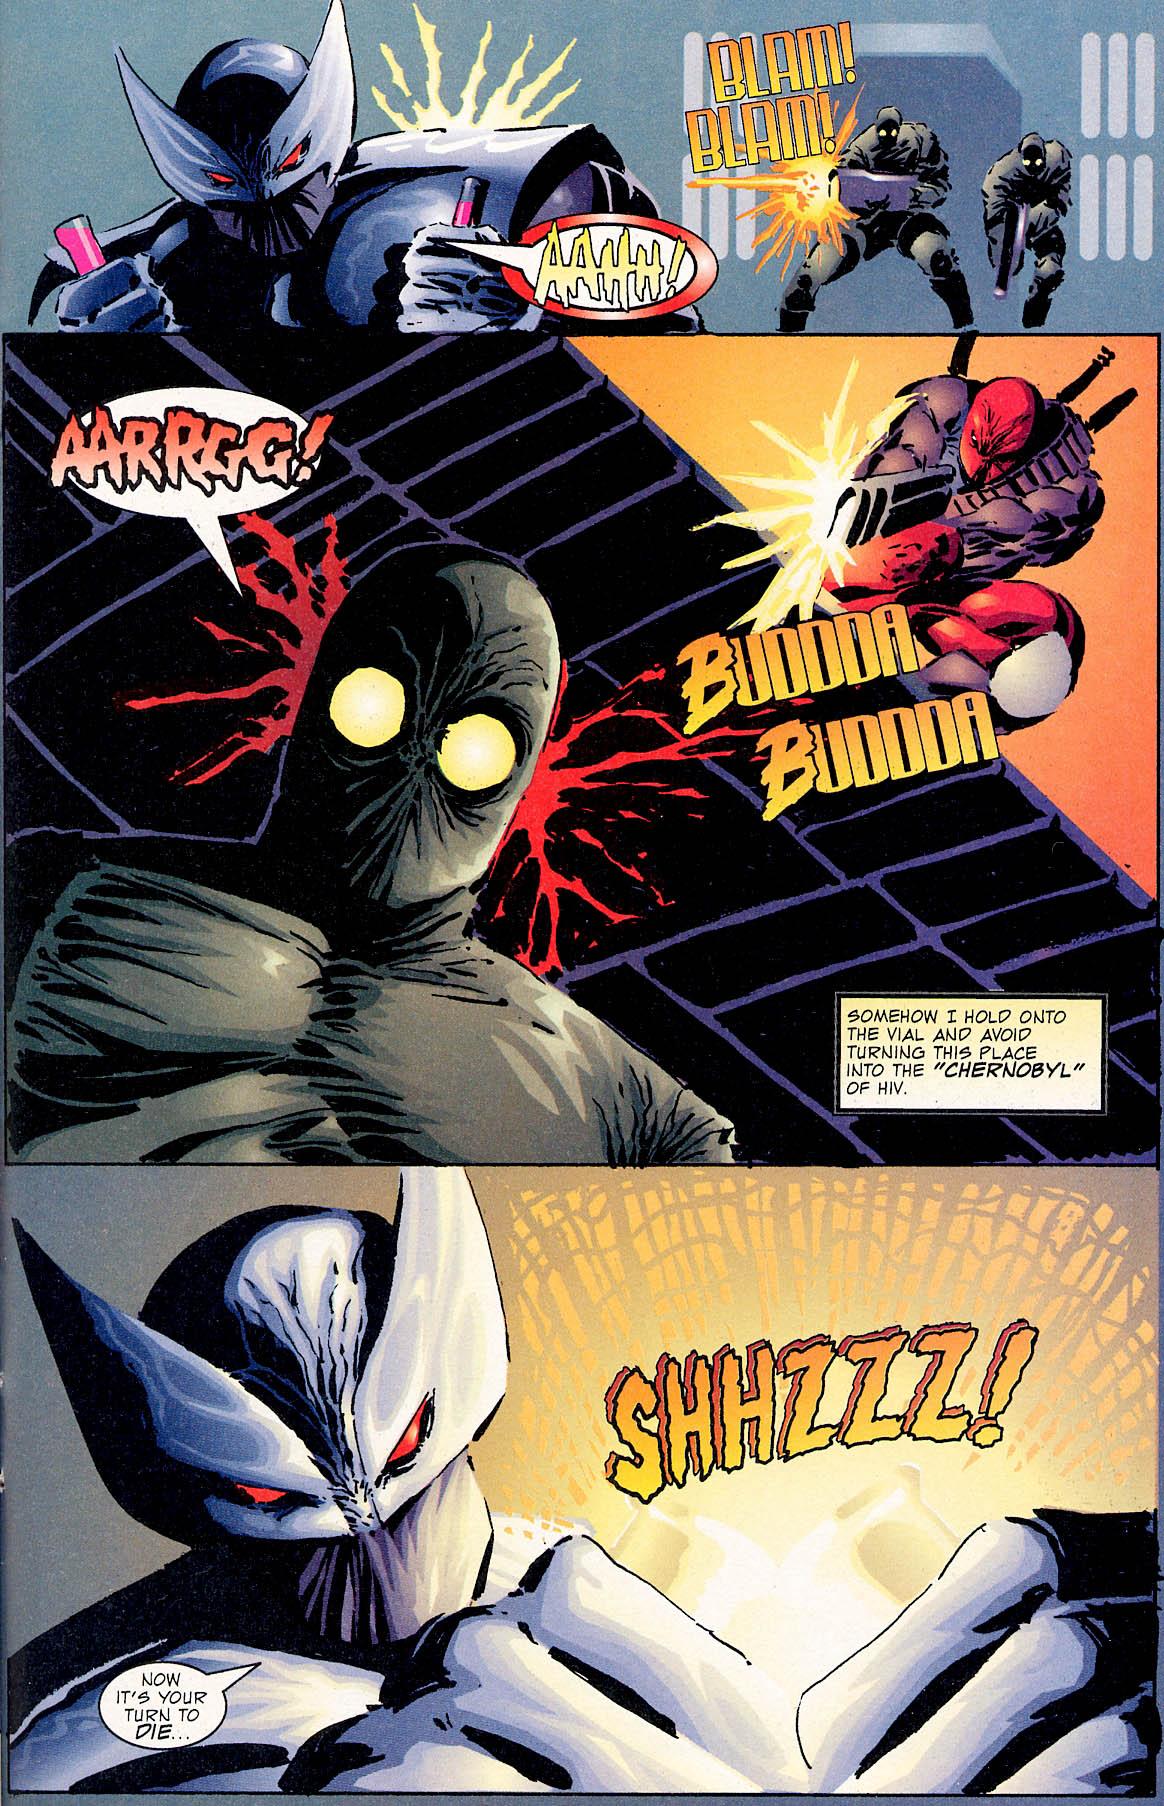 Read online ShadowHawk comic -  Issue #0 - 15